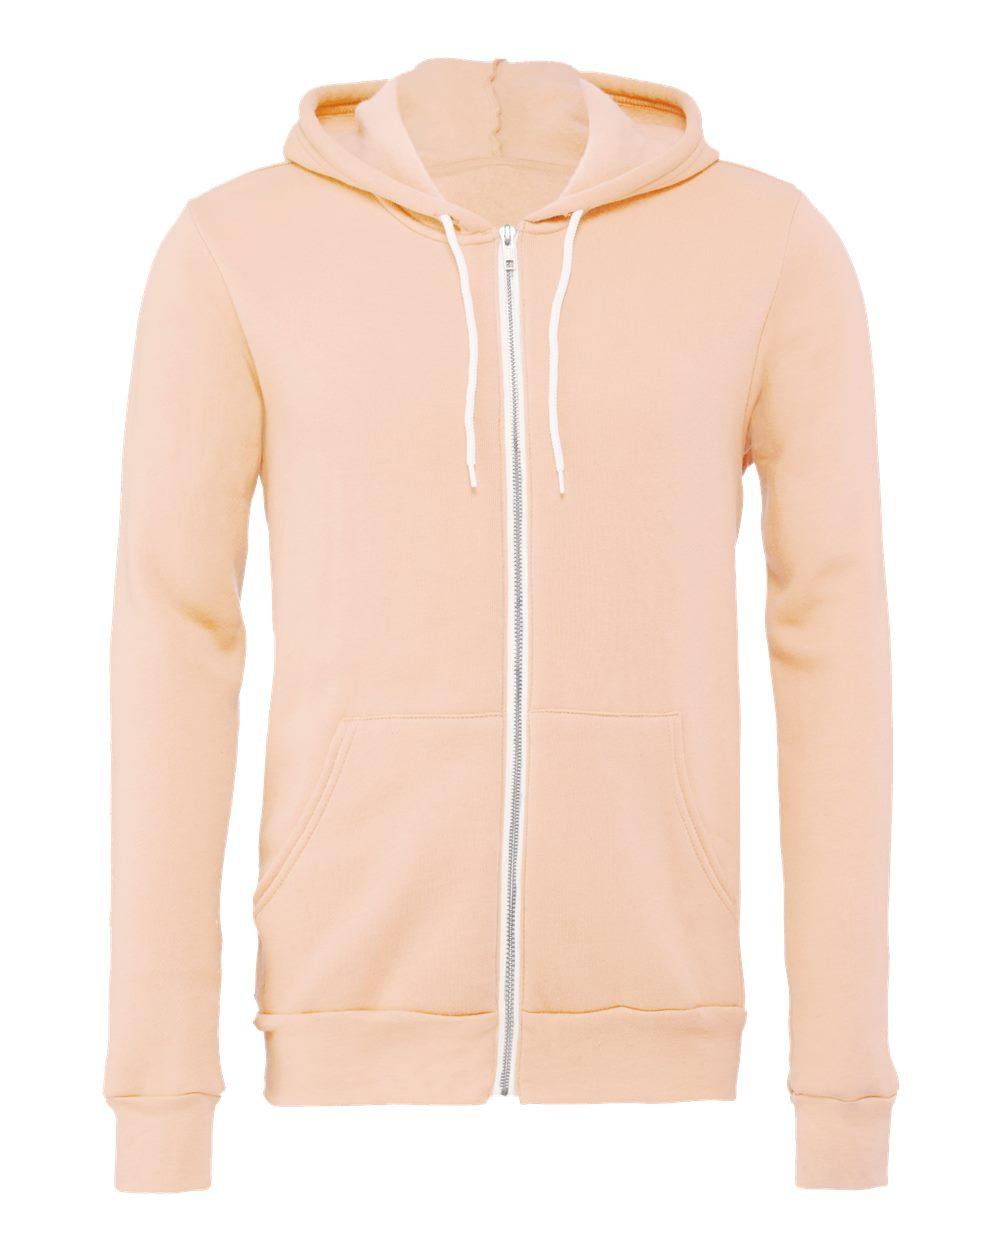 Bella-Canvas-Unisex-Full-Zip-Up-Hooded-Sweatshirt-Blank-Hoodie-3739-up-to-3XL thumbnail 77